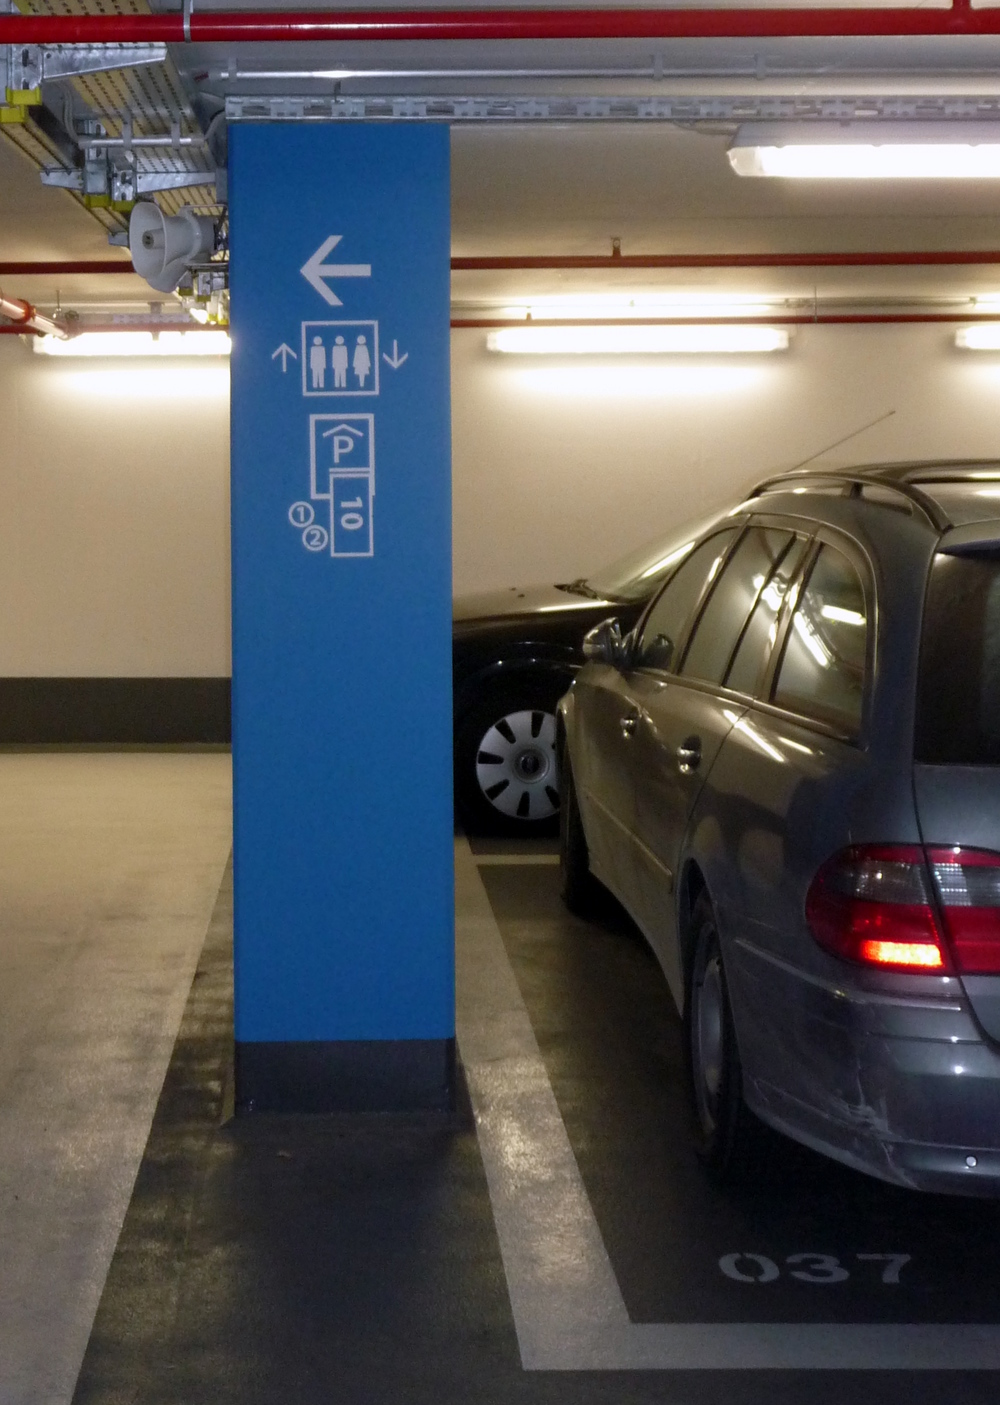 TG Wegweiser Fußgänger zu Kasse.JPG